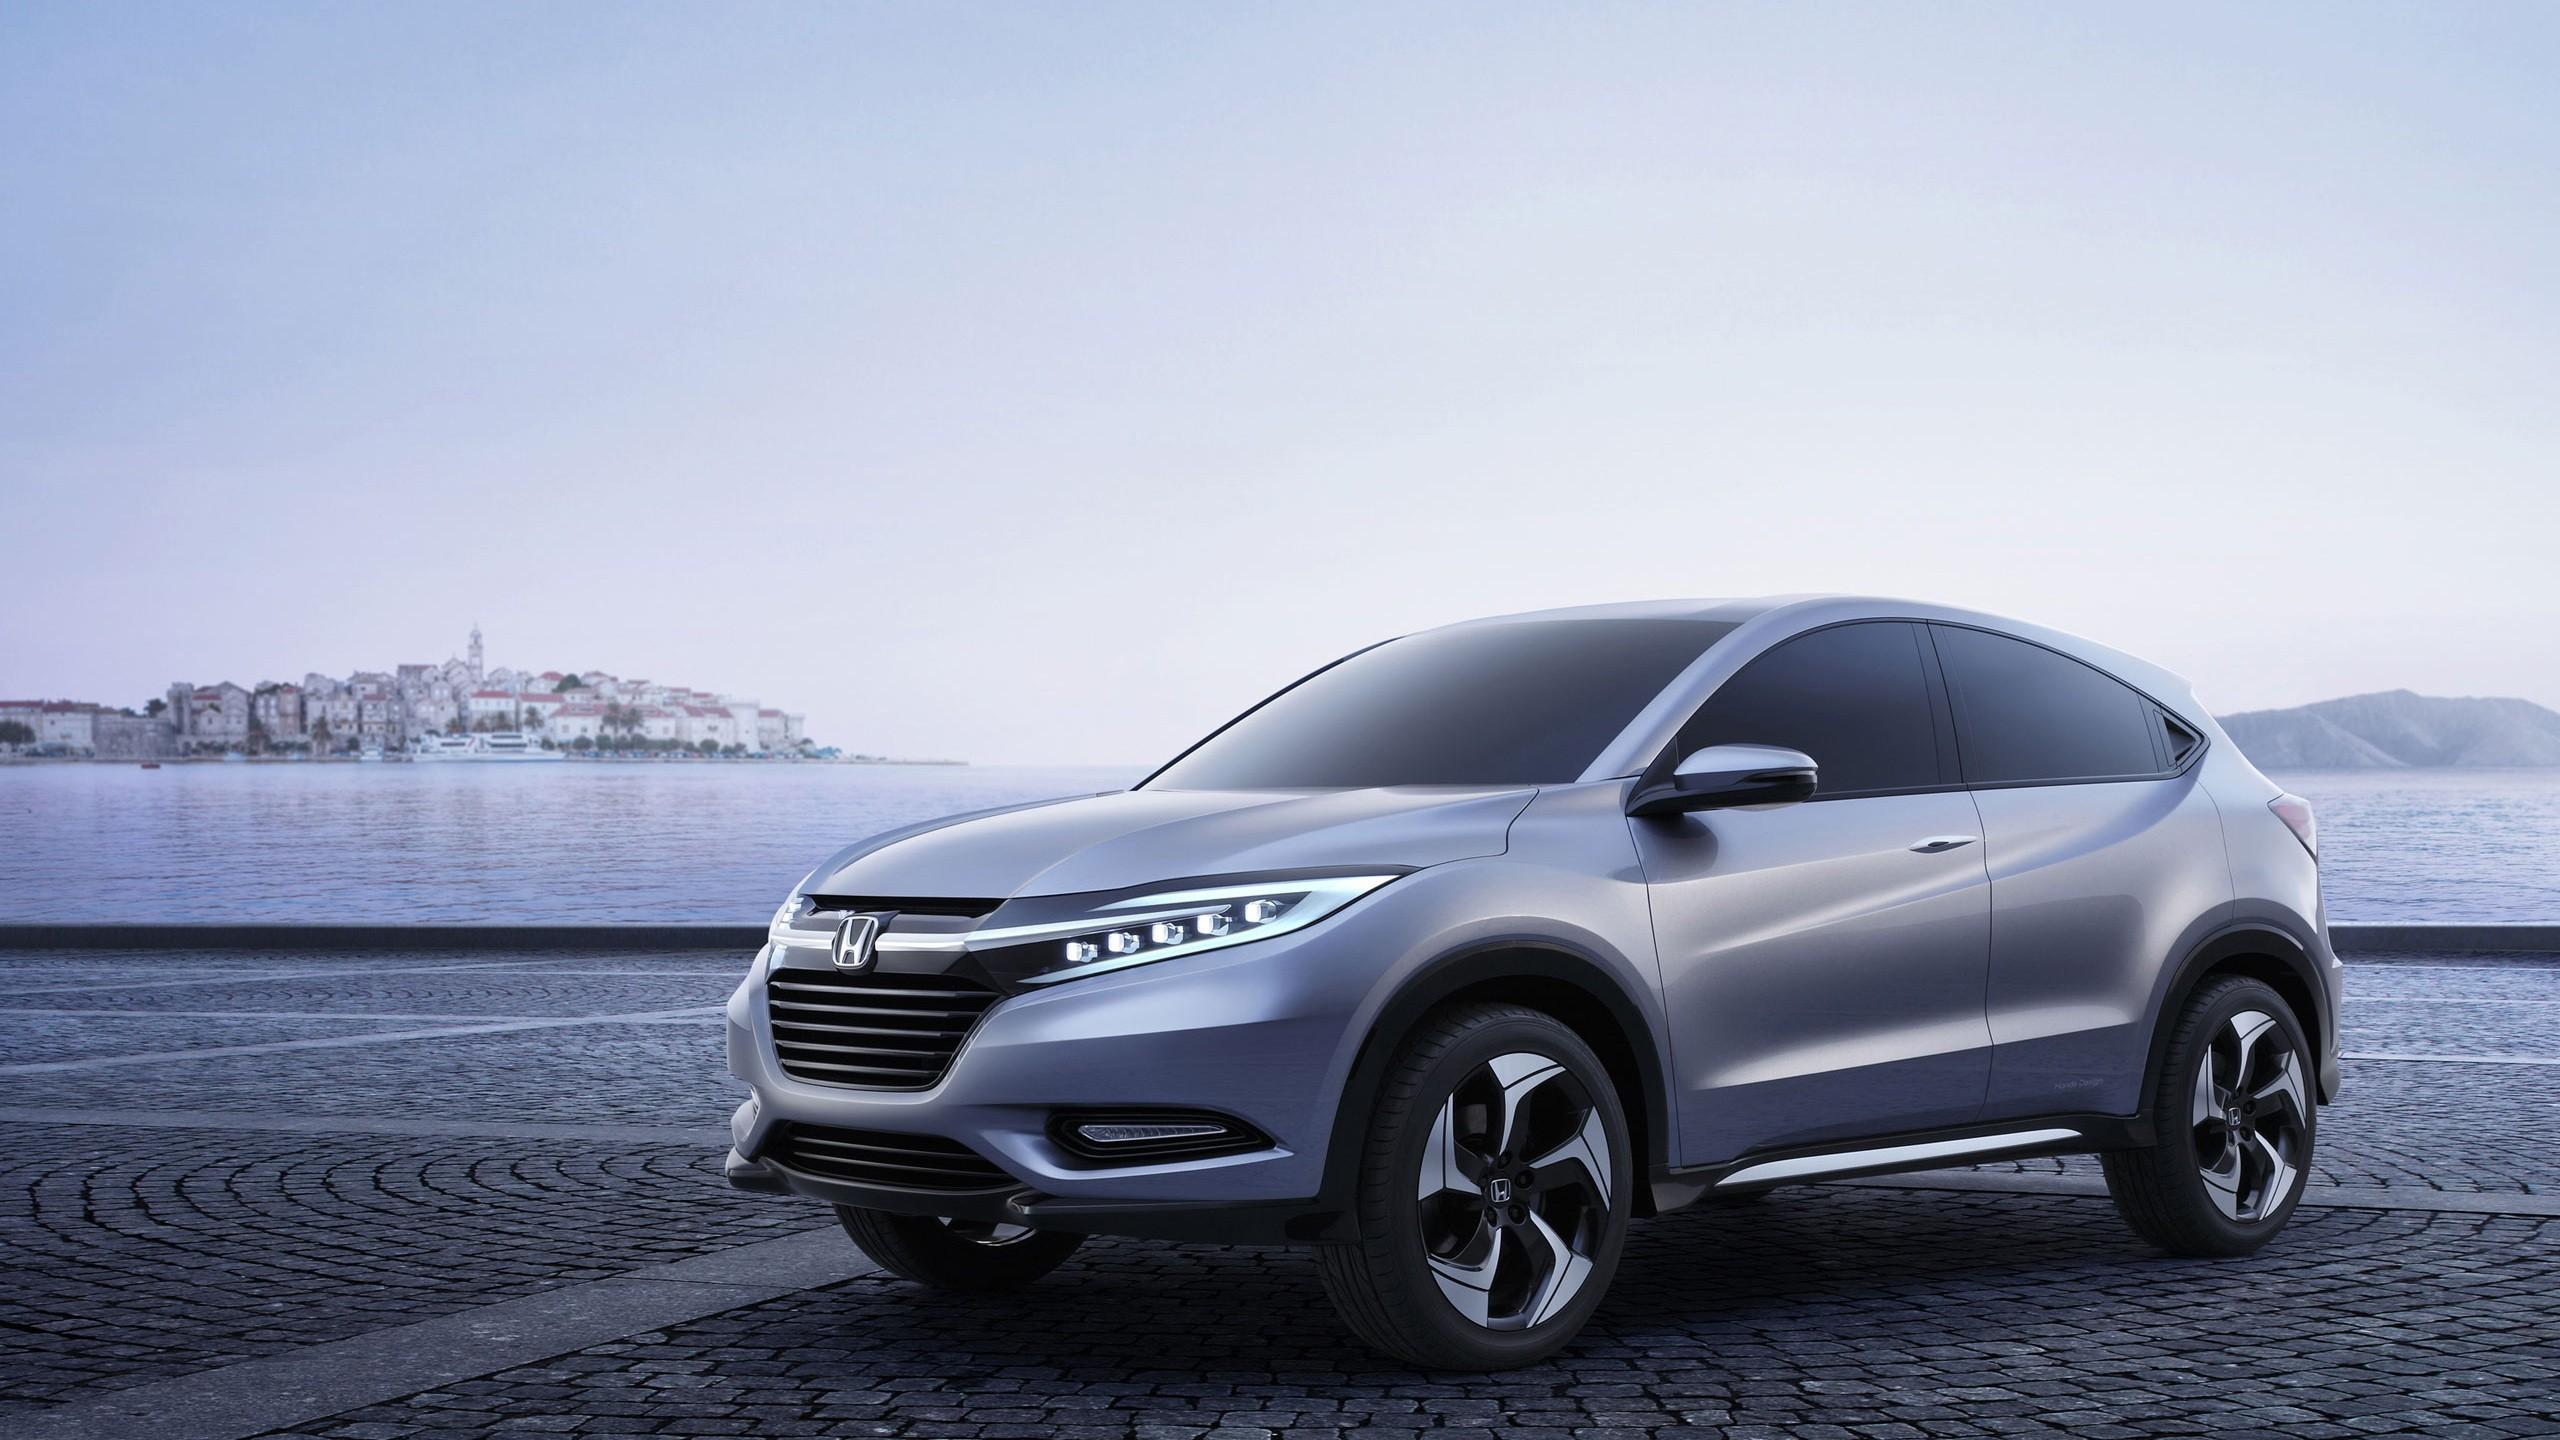 Honda Urban SUV Concept Wallpaper | HD Car Wallpapers | ID ...